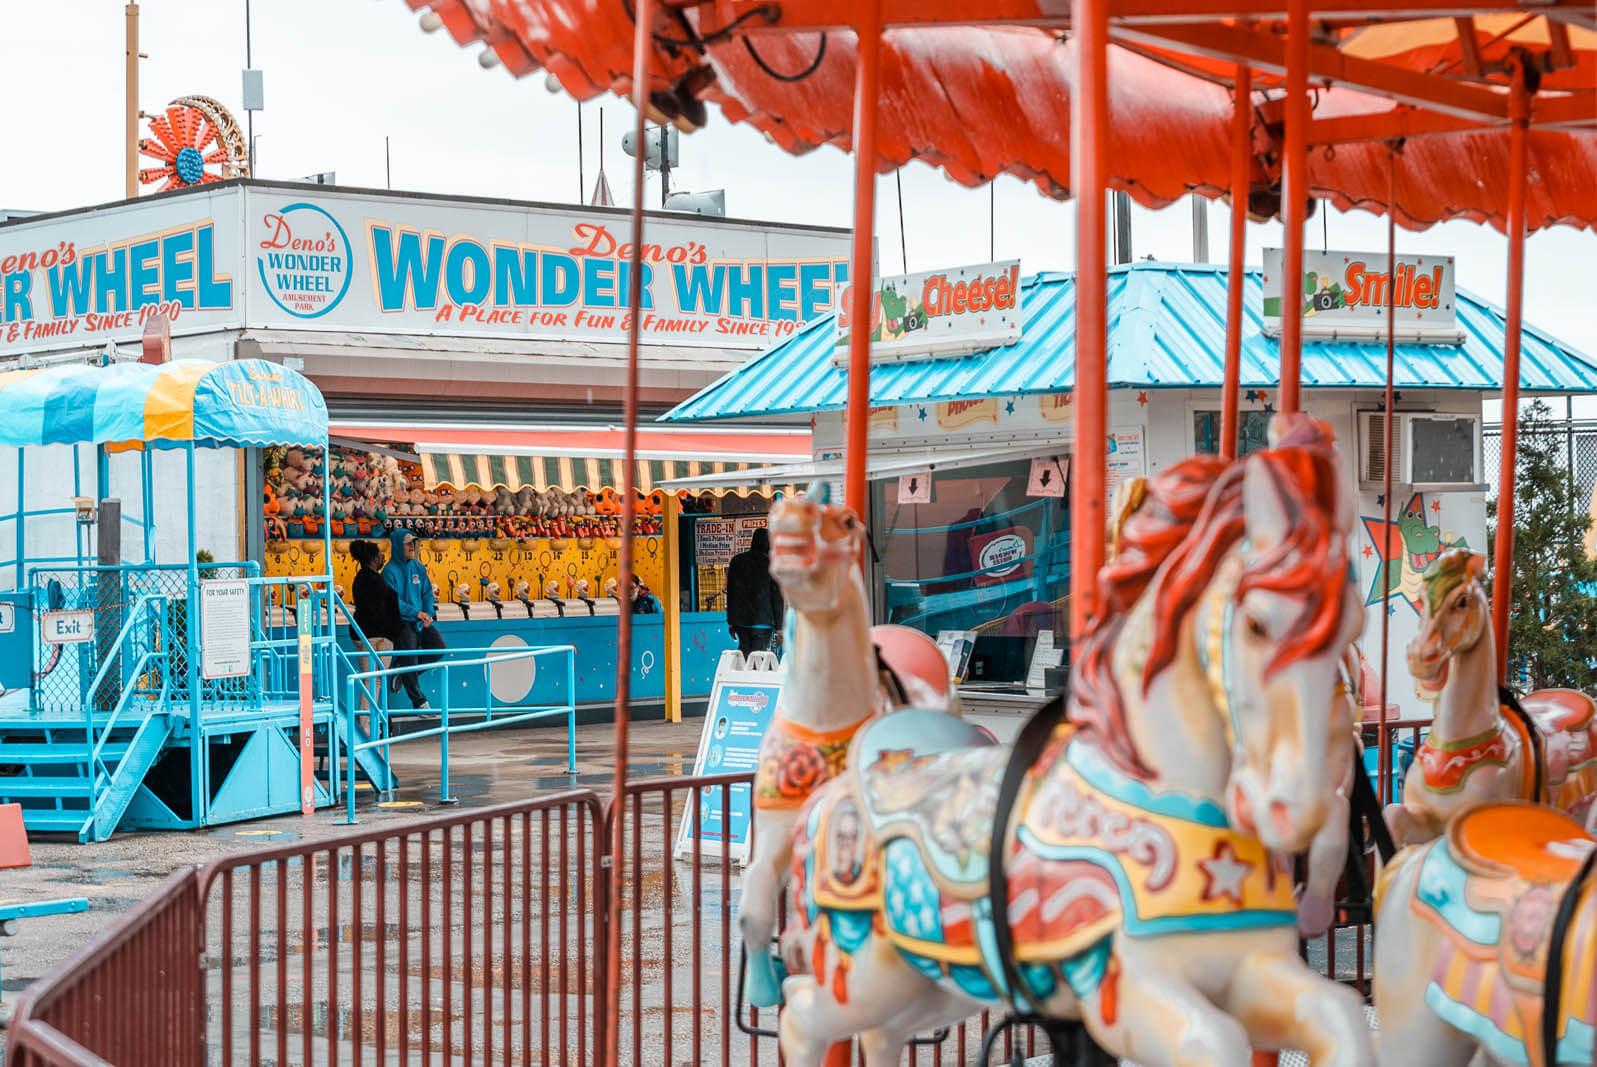 wonder wheel carousel at Denos Wonder Wheel Park at Coney Island